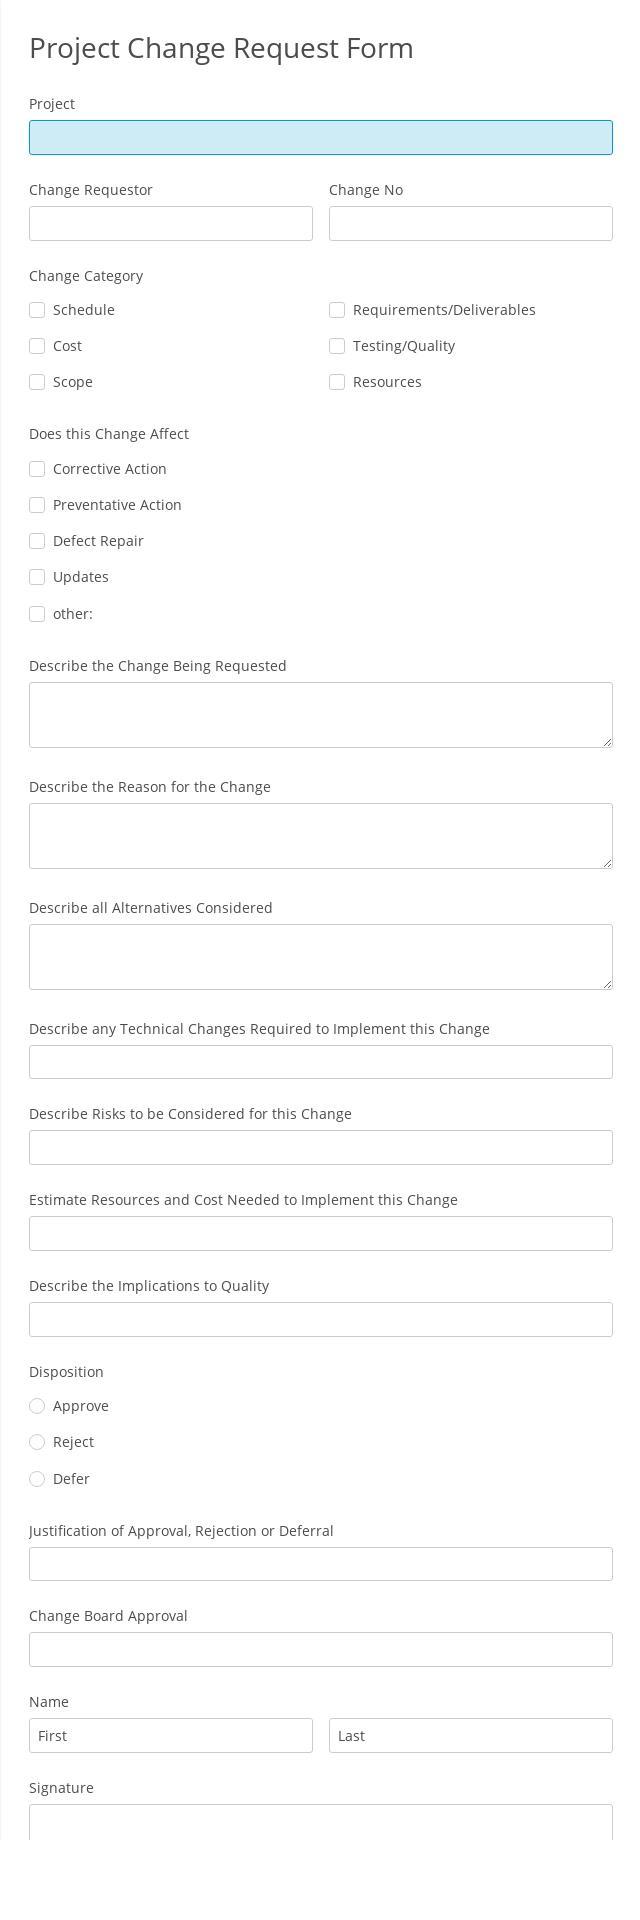 Project Change Request Form